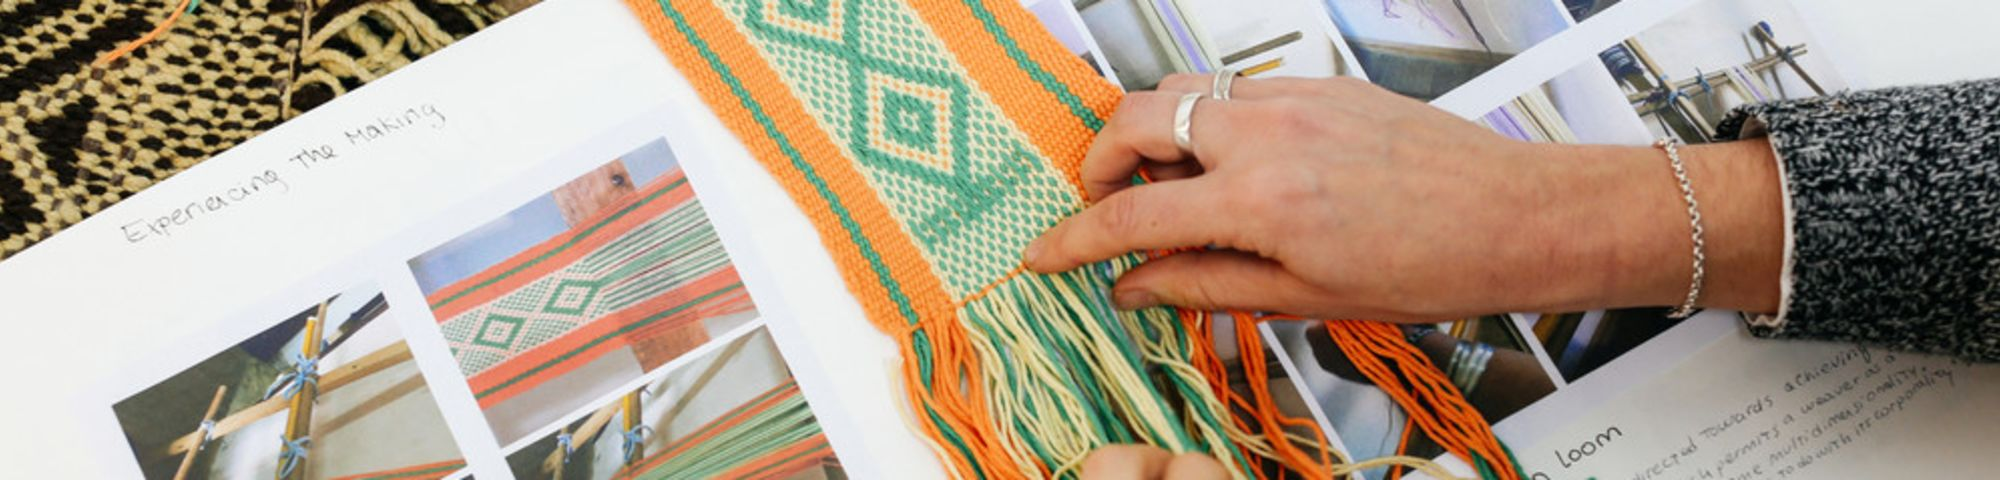 Textile Design Subject Child Image